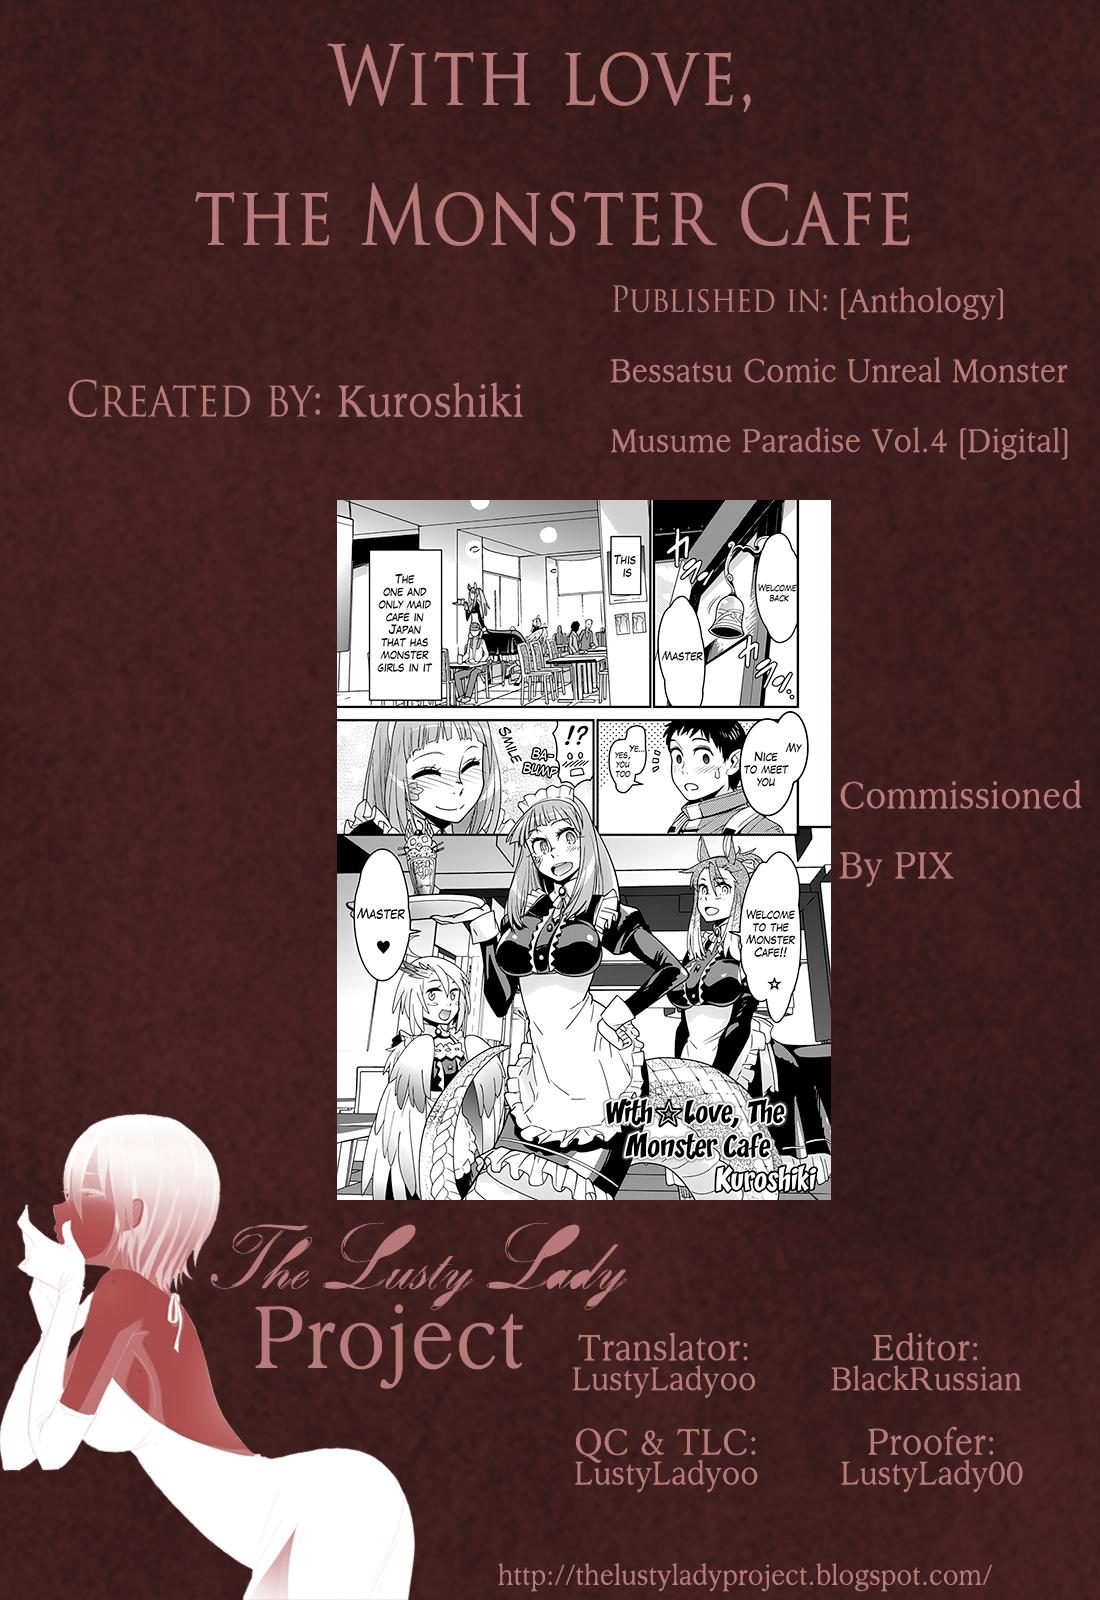 Bessatsu Comic Unreal Monster Musume Paradise Vol. 4 63